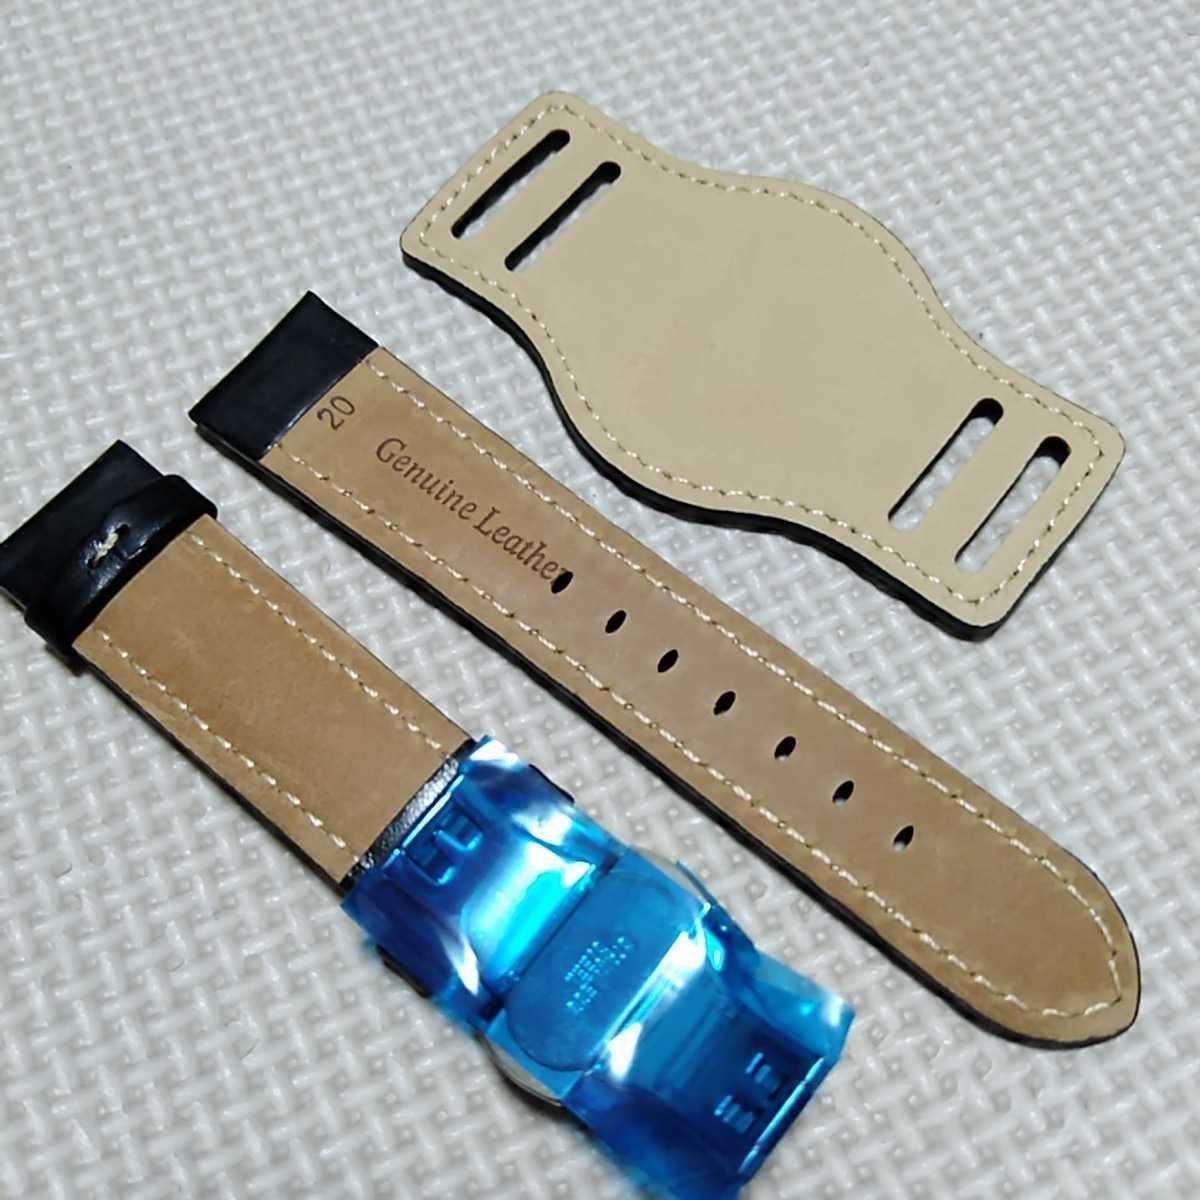 No75 ブンド BUND 本革レザーベルト 腕時計ベルト 交換用ストラップ ブラック 20mm 未使用 Dバックル 高品質 ドイツパイロット 空軍_画像4